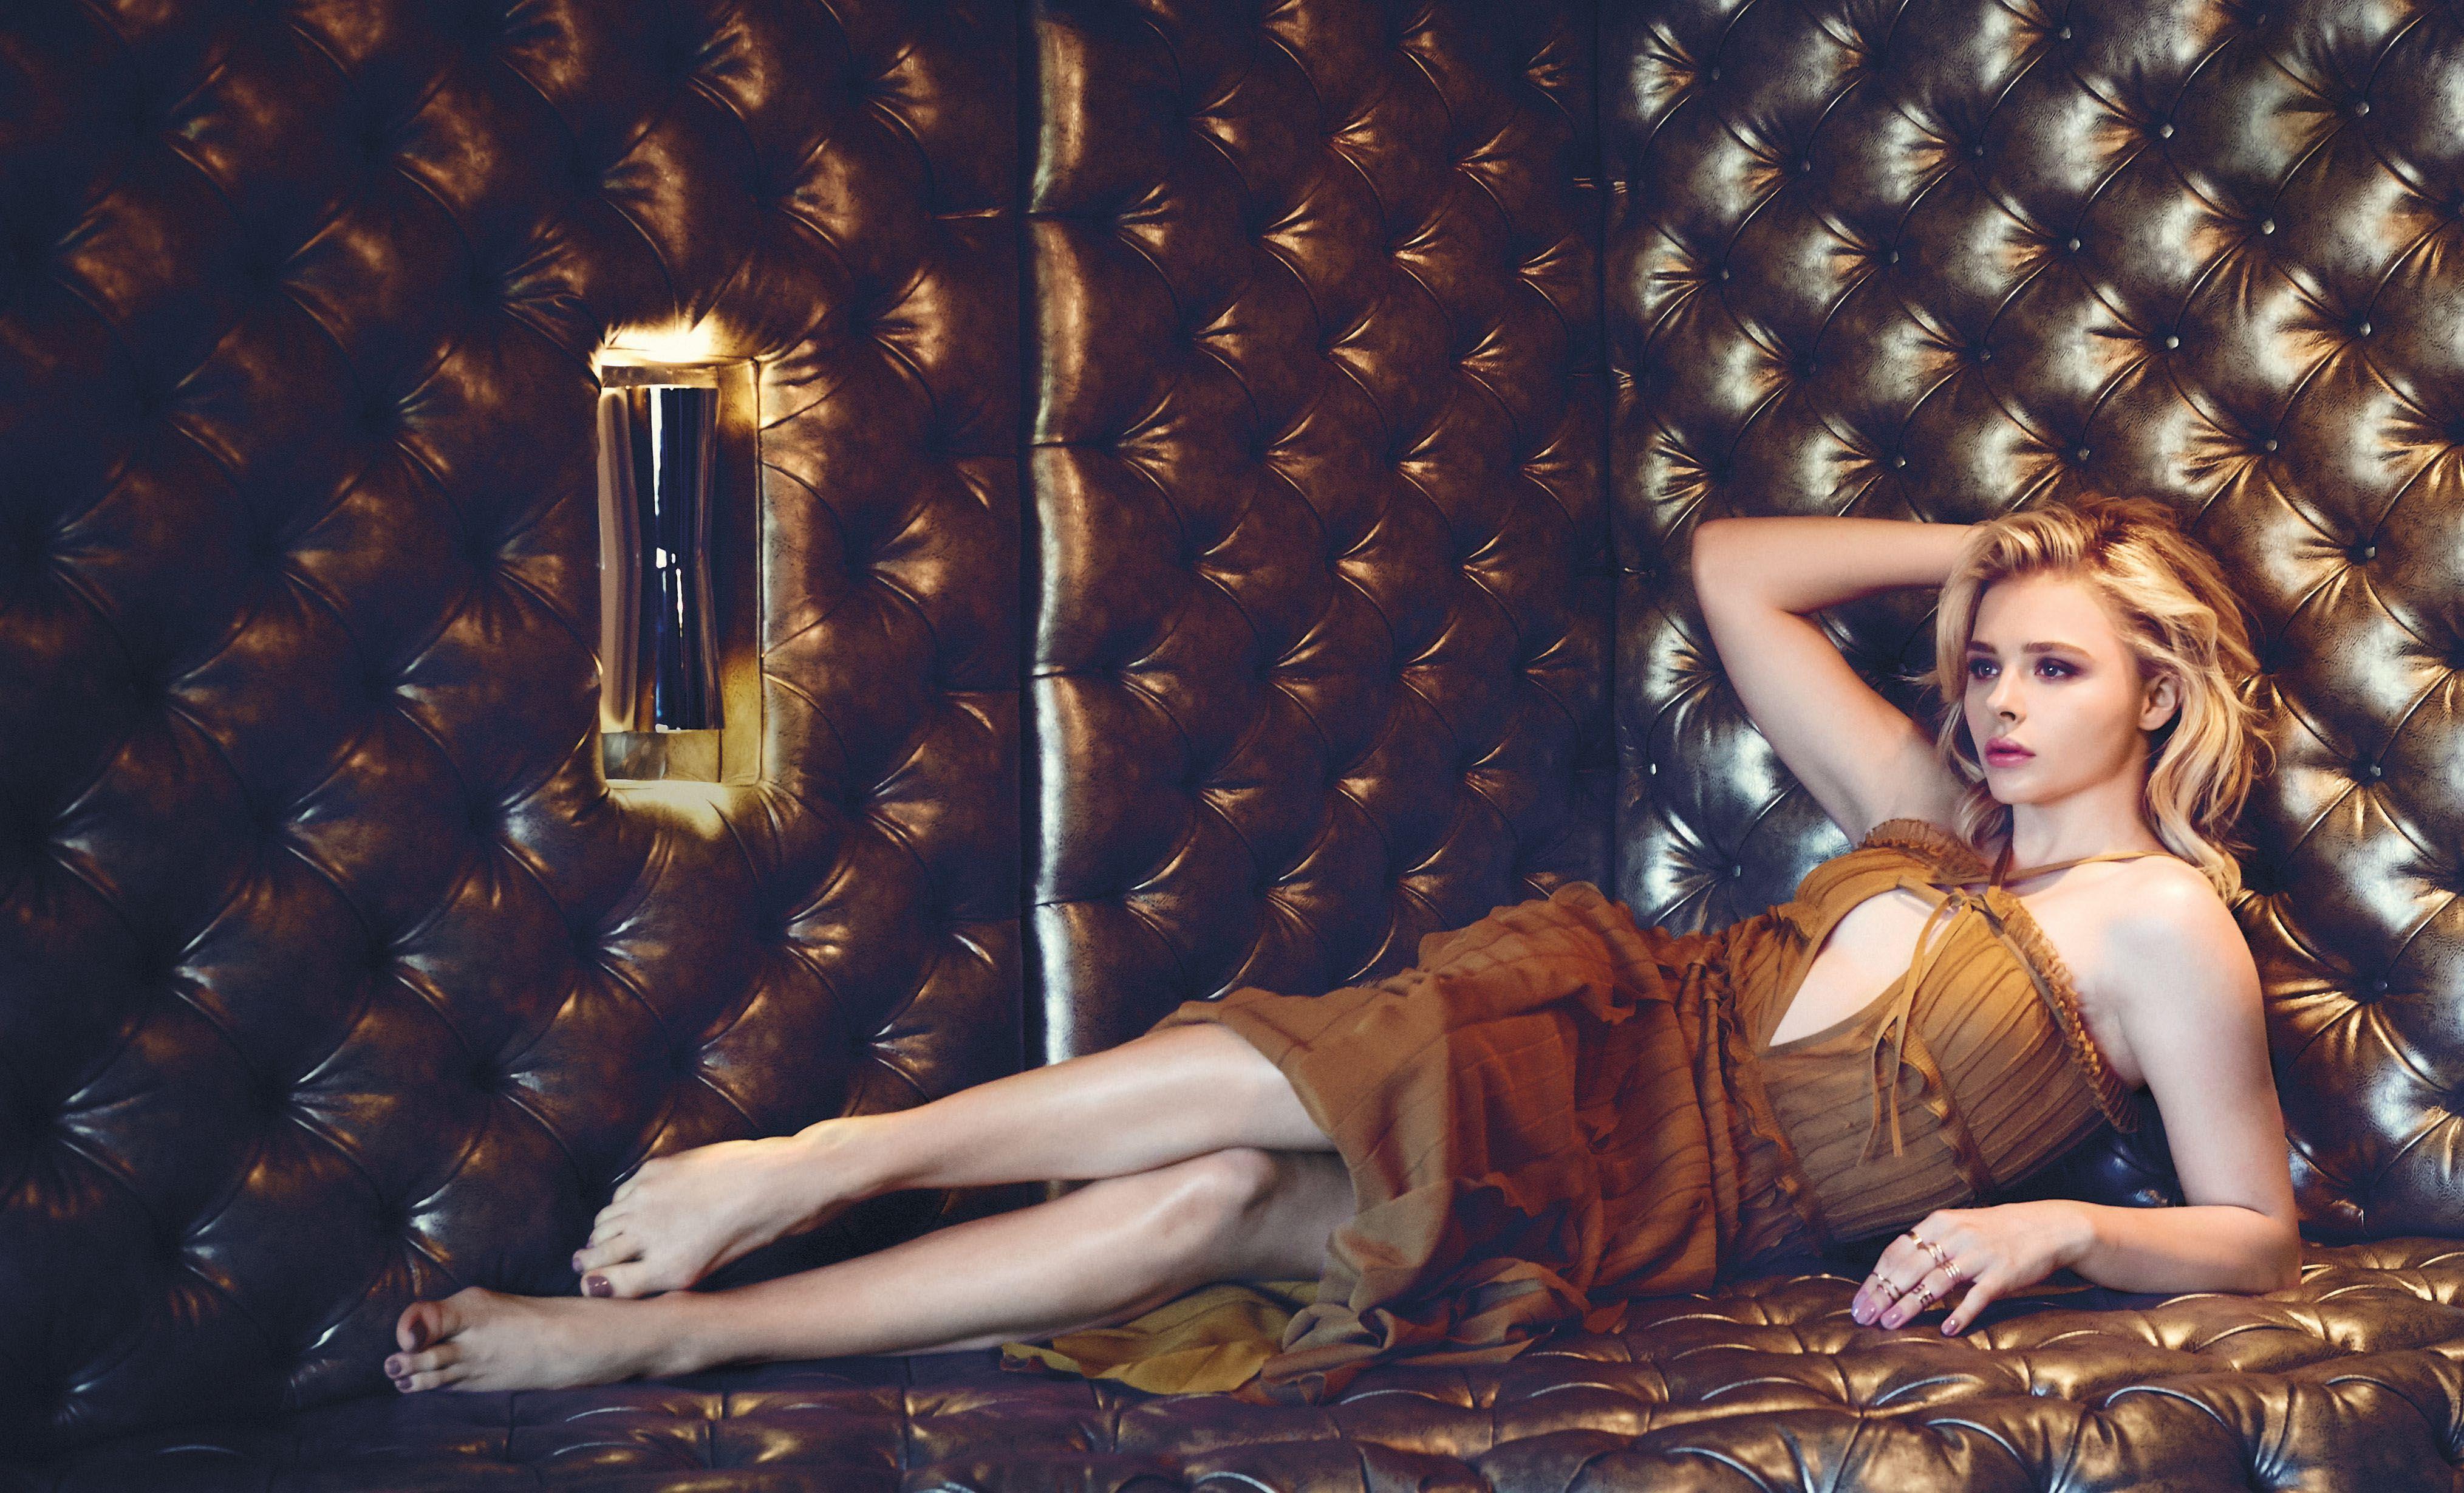 Chloe Grace Moretz Sexy Nude